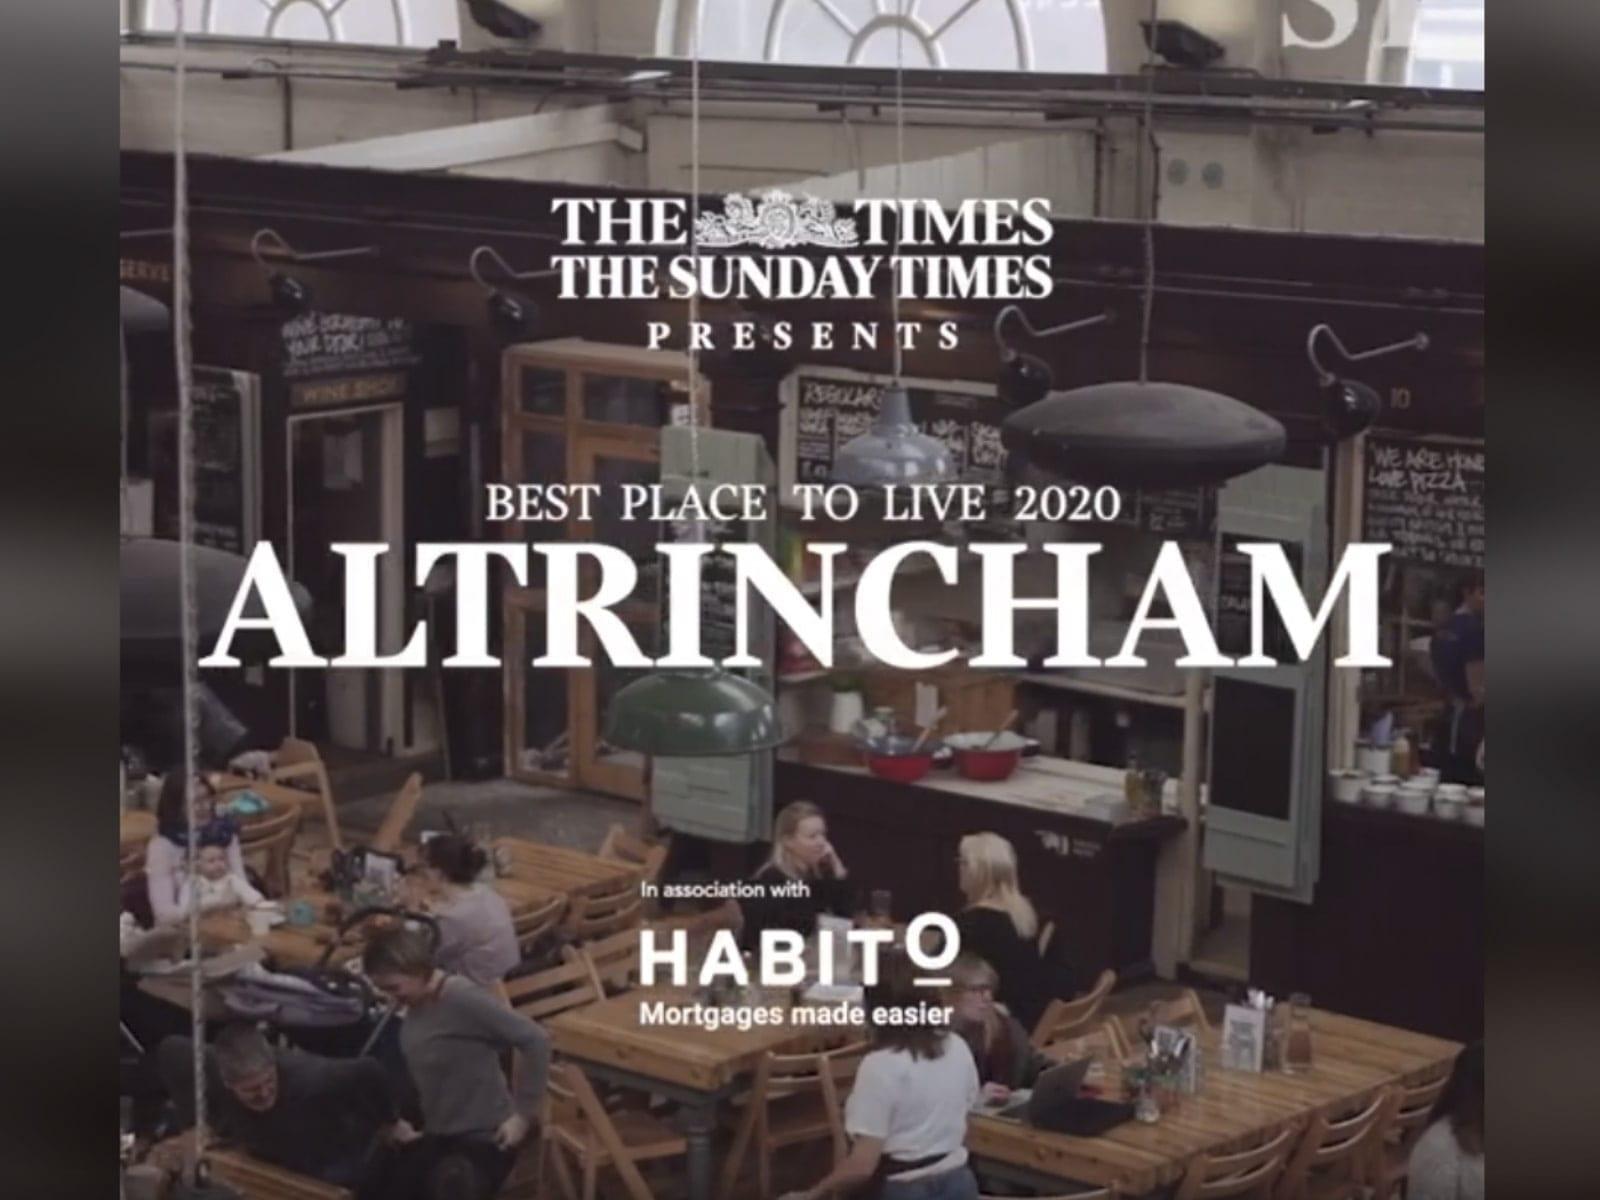 Altrincham Image 01